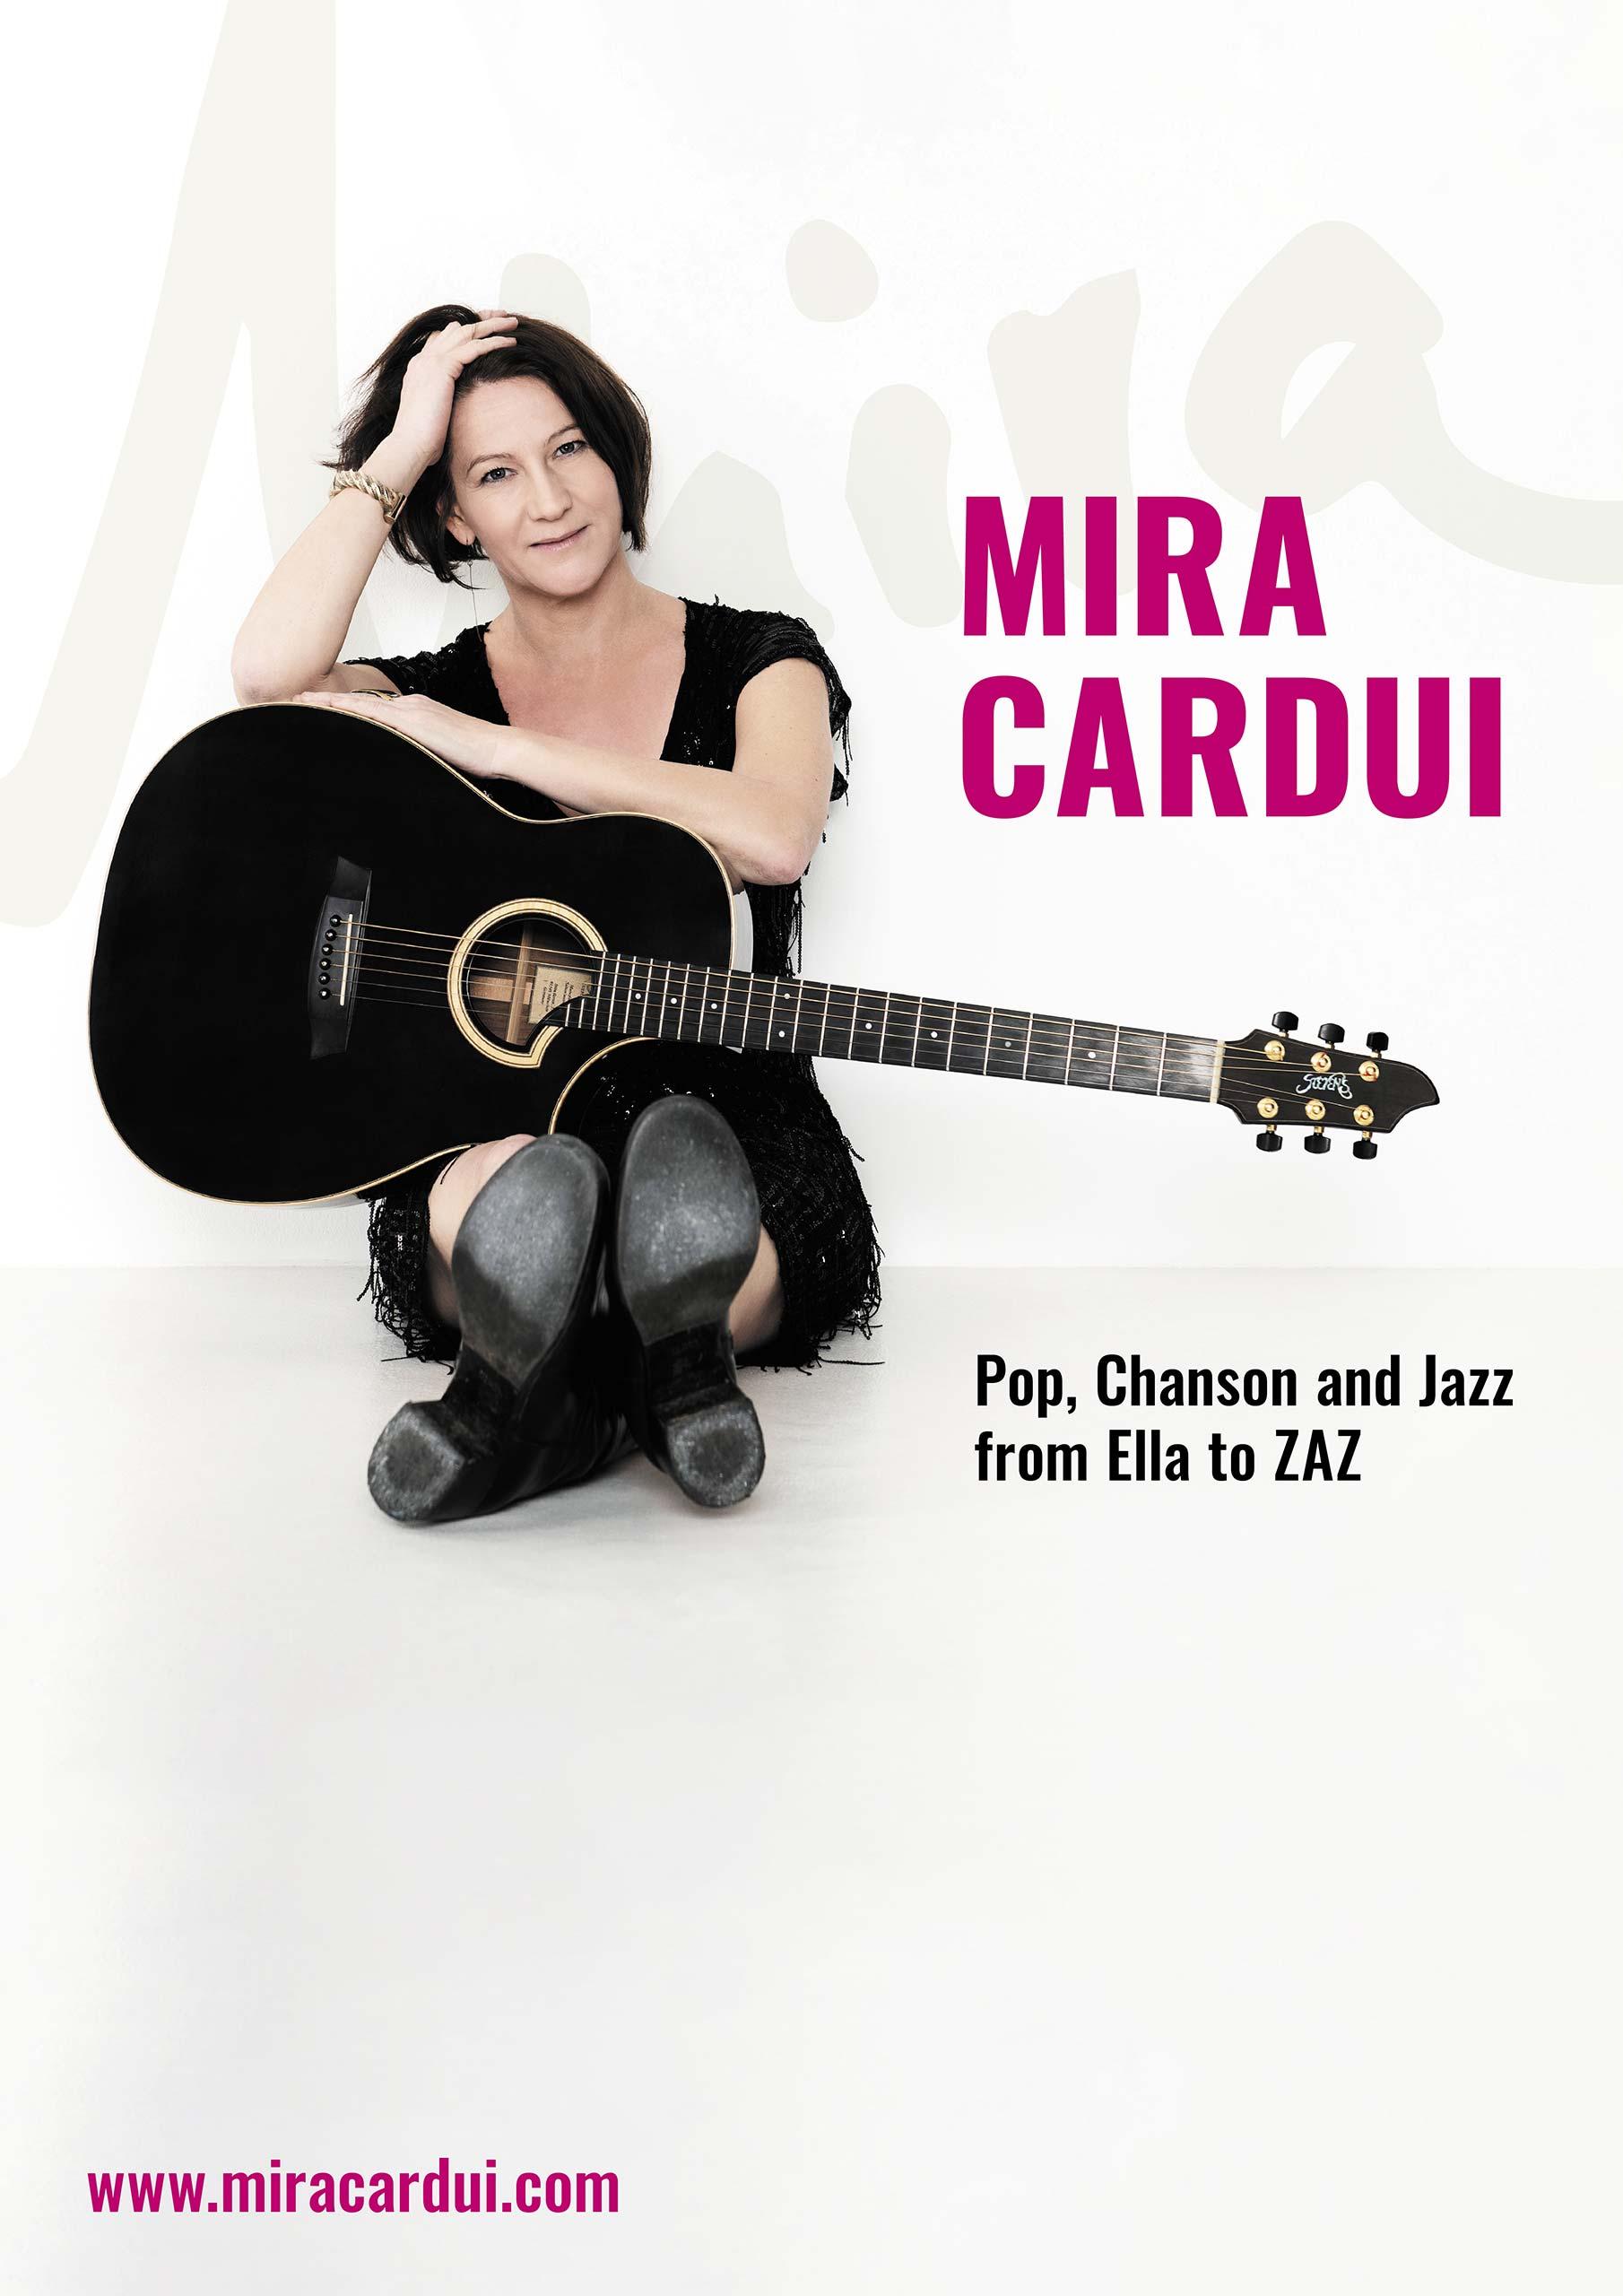 Plakat Pop Chanson and Jazz Mira Cardui DIN A3 und DIN A2 zum Download